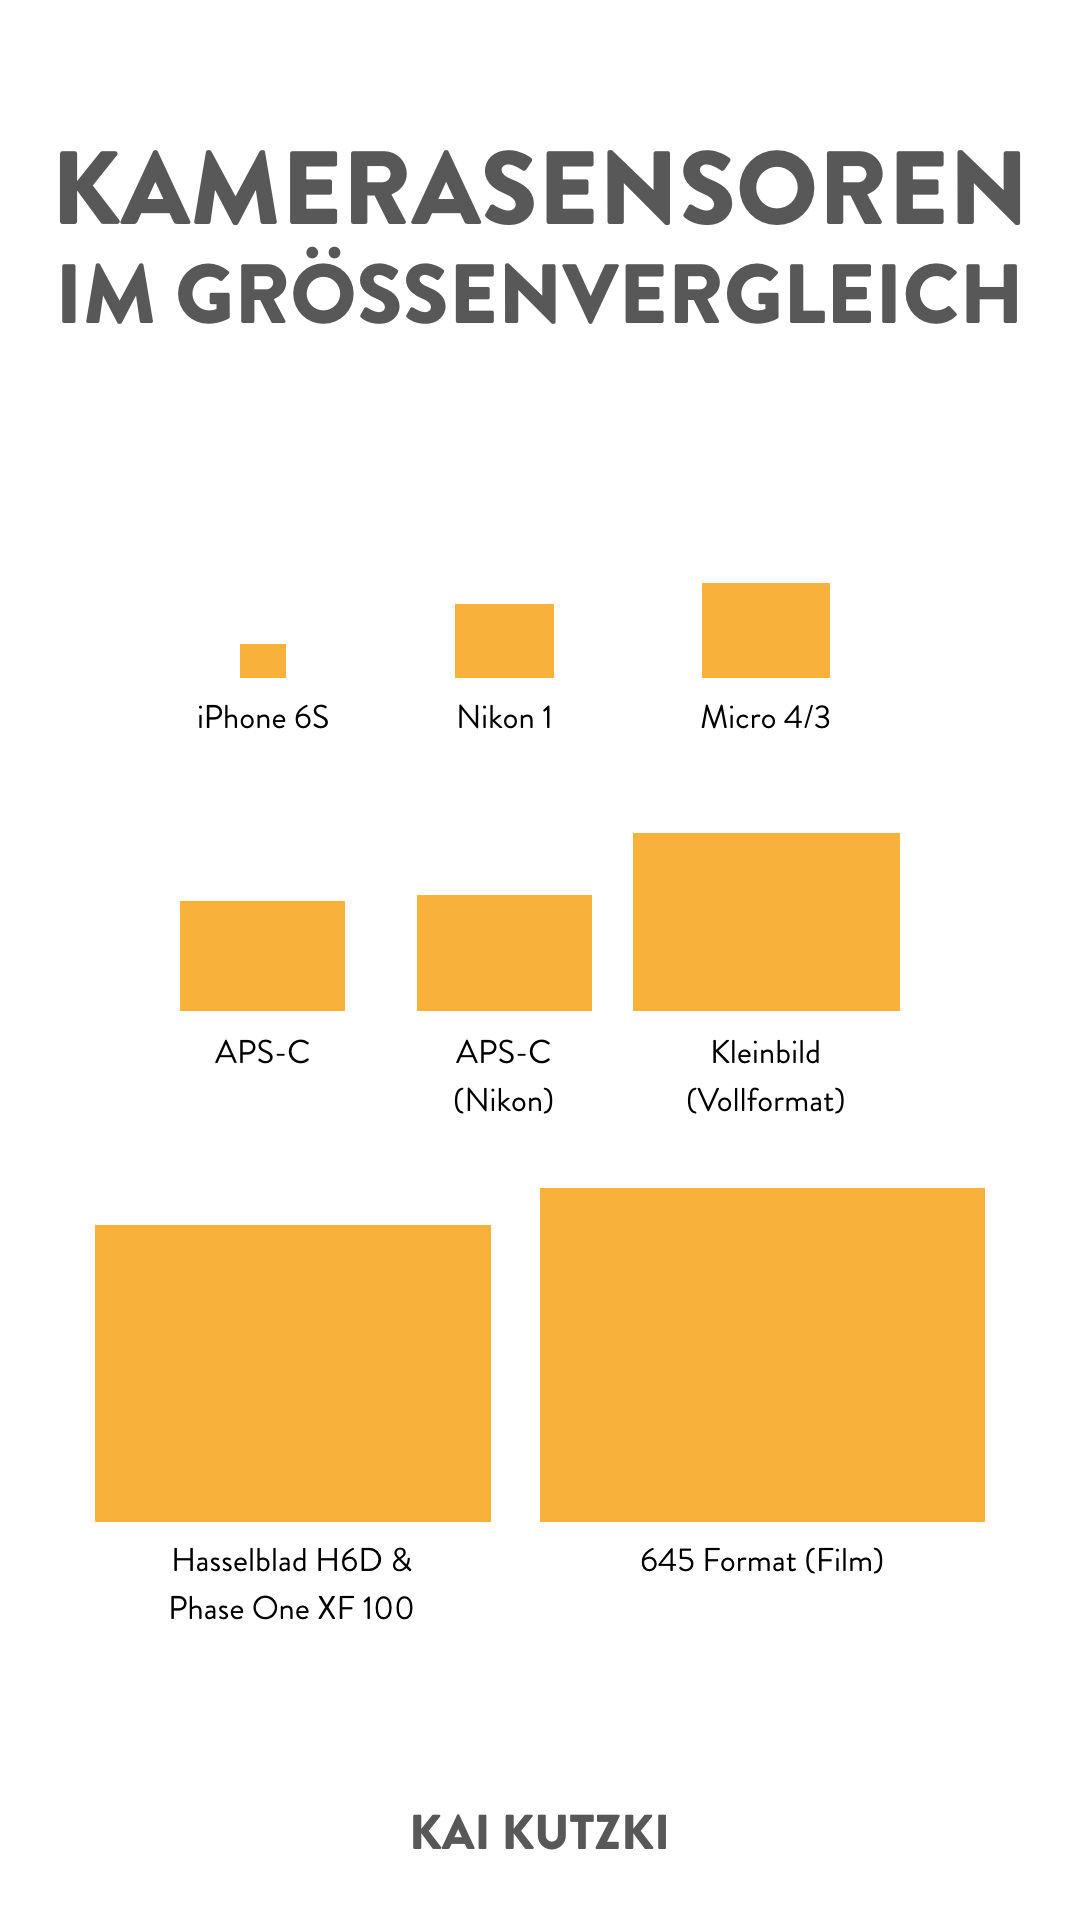 Kamera-Sensorgrößen im Vergleich – Infografik – Vollformat, MFT, Micro 4/3, APS-C, Mittelformat